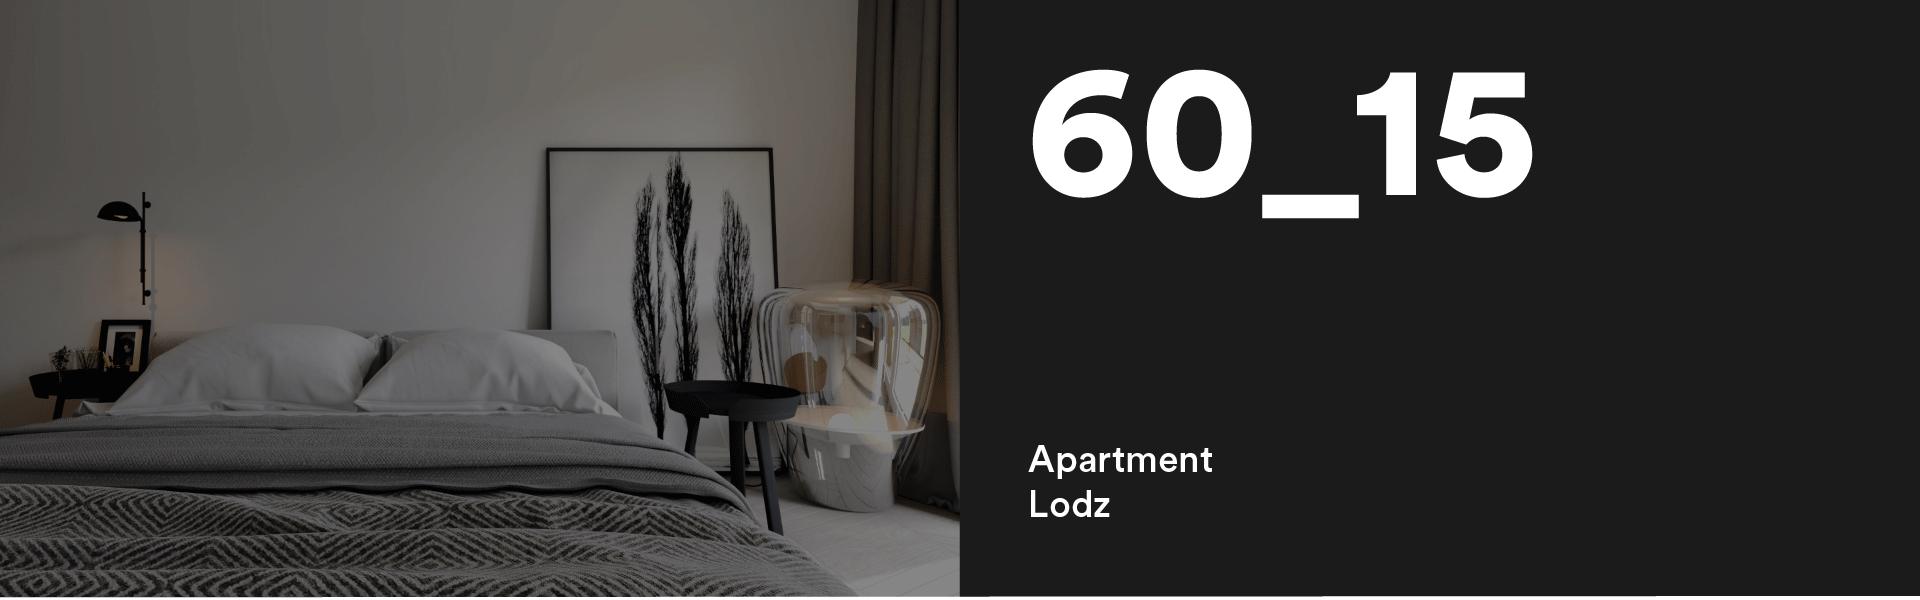 60_15 Apartment  Lodz